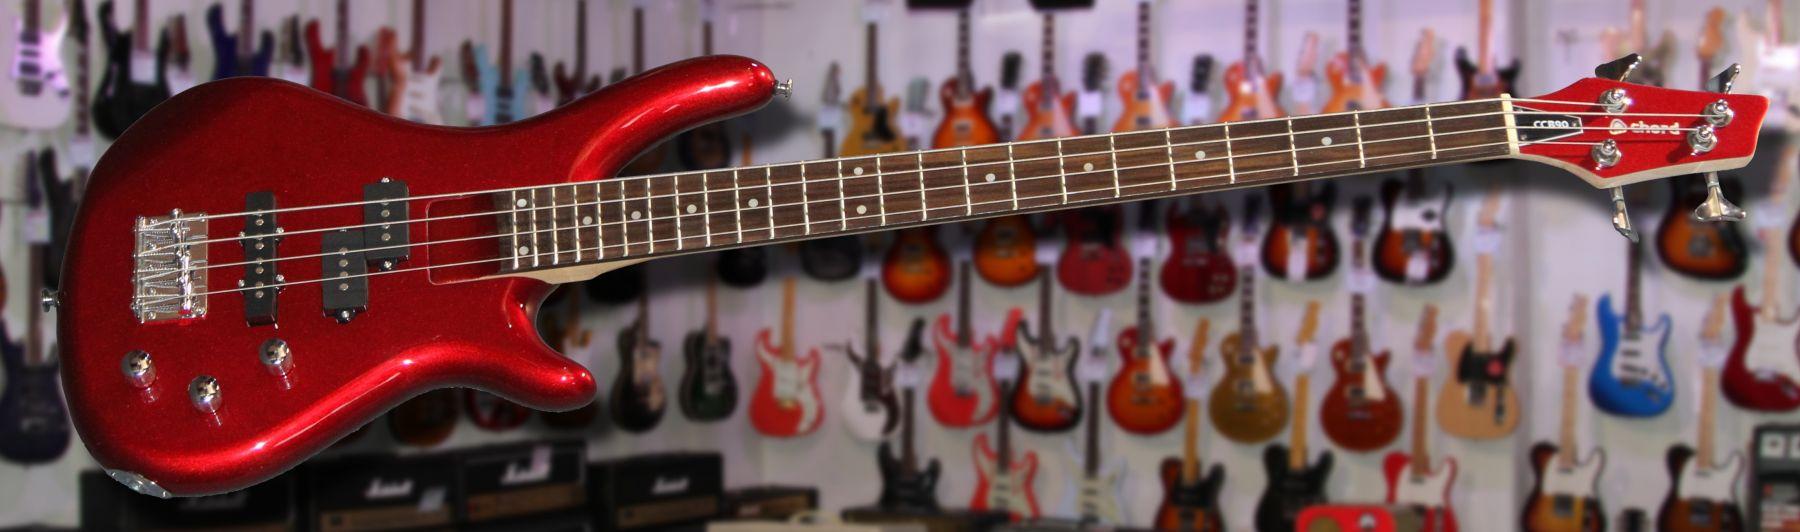 rock factory bass guitars chord ccb90 bass guitar metallic red. Black Bedroom Furniture Sets. Home Design Ideas